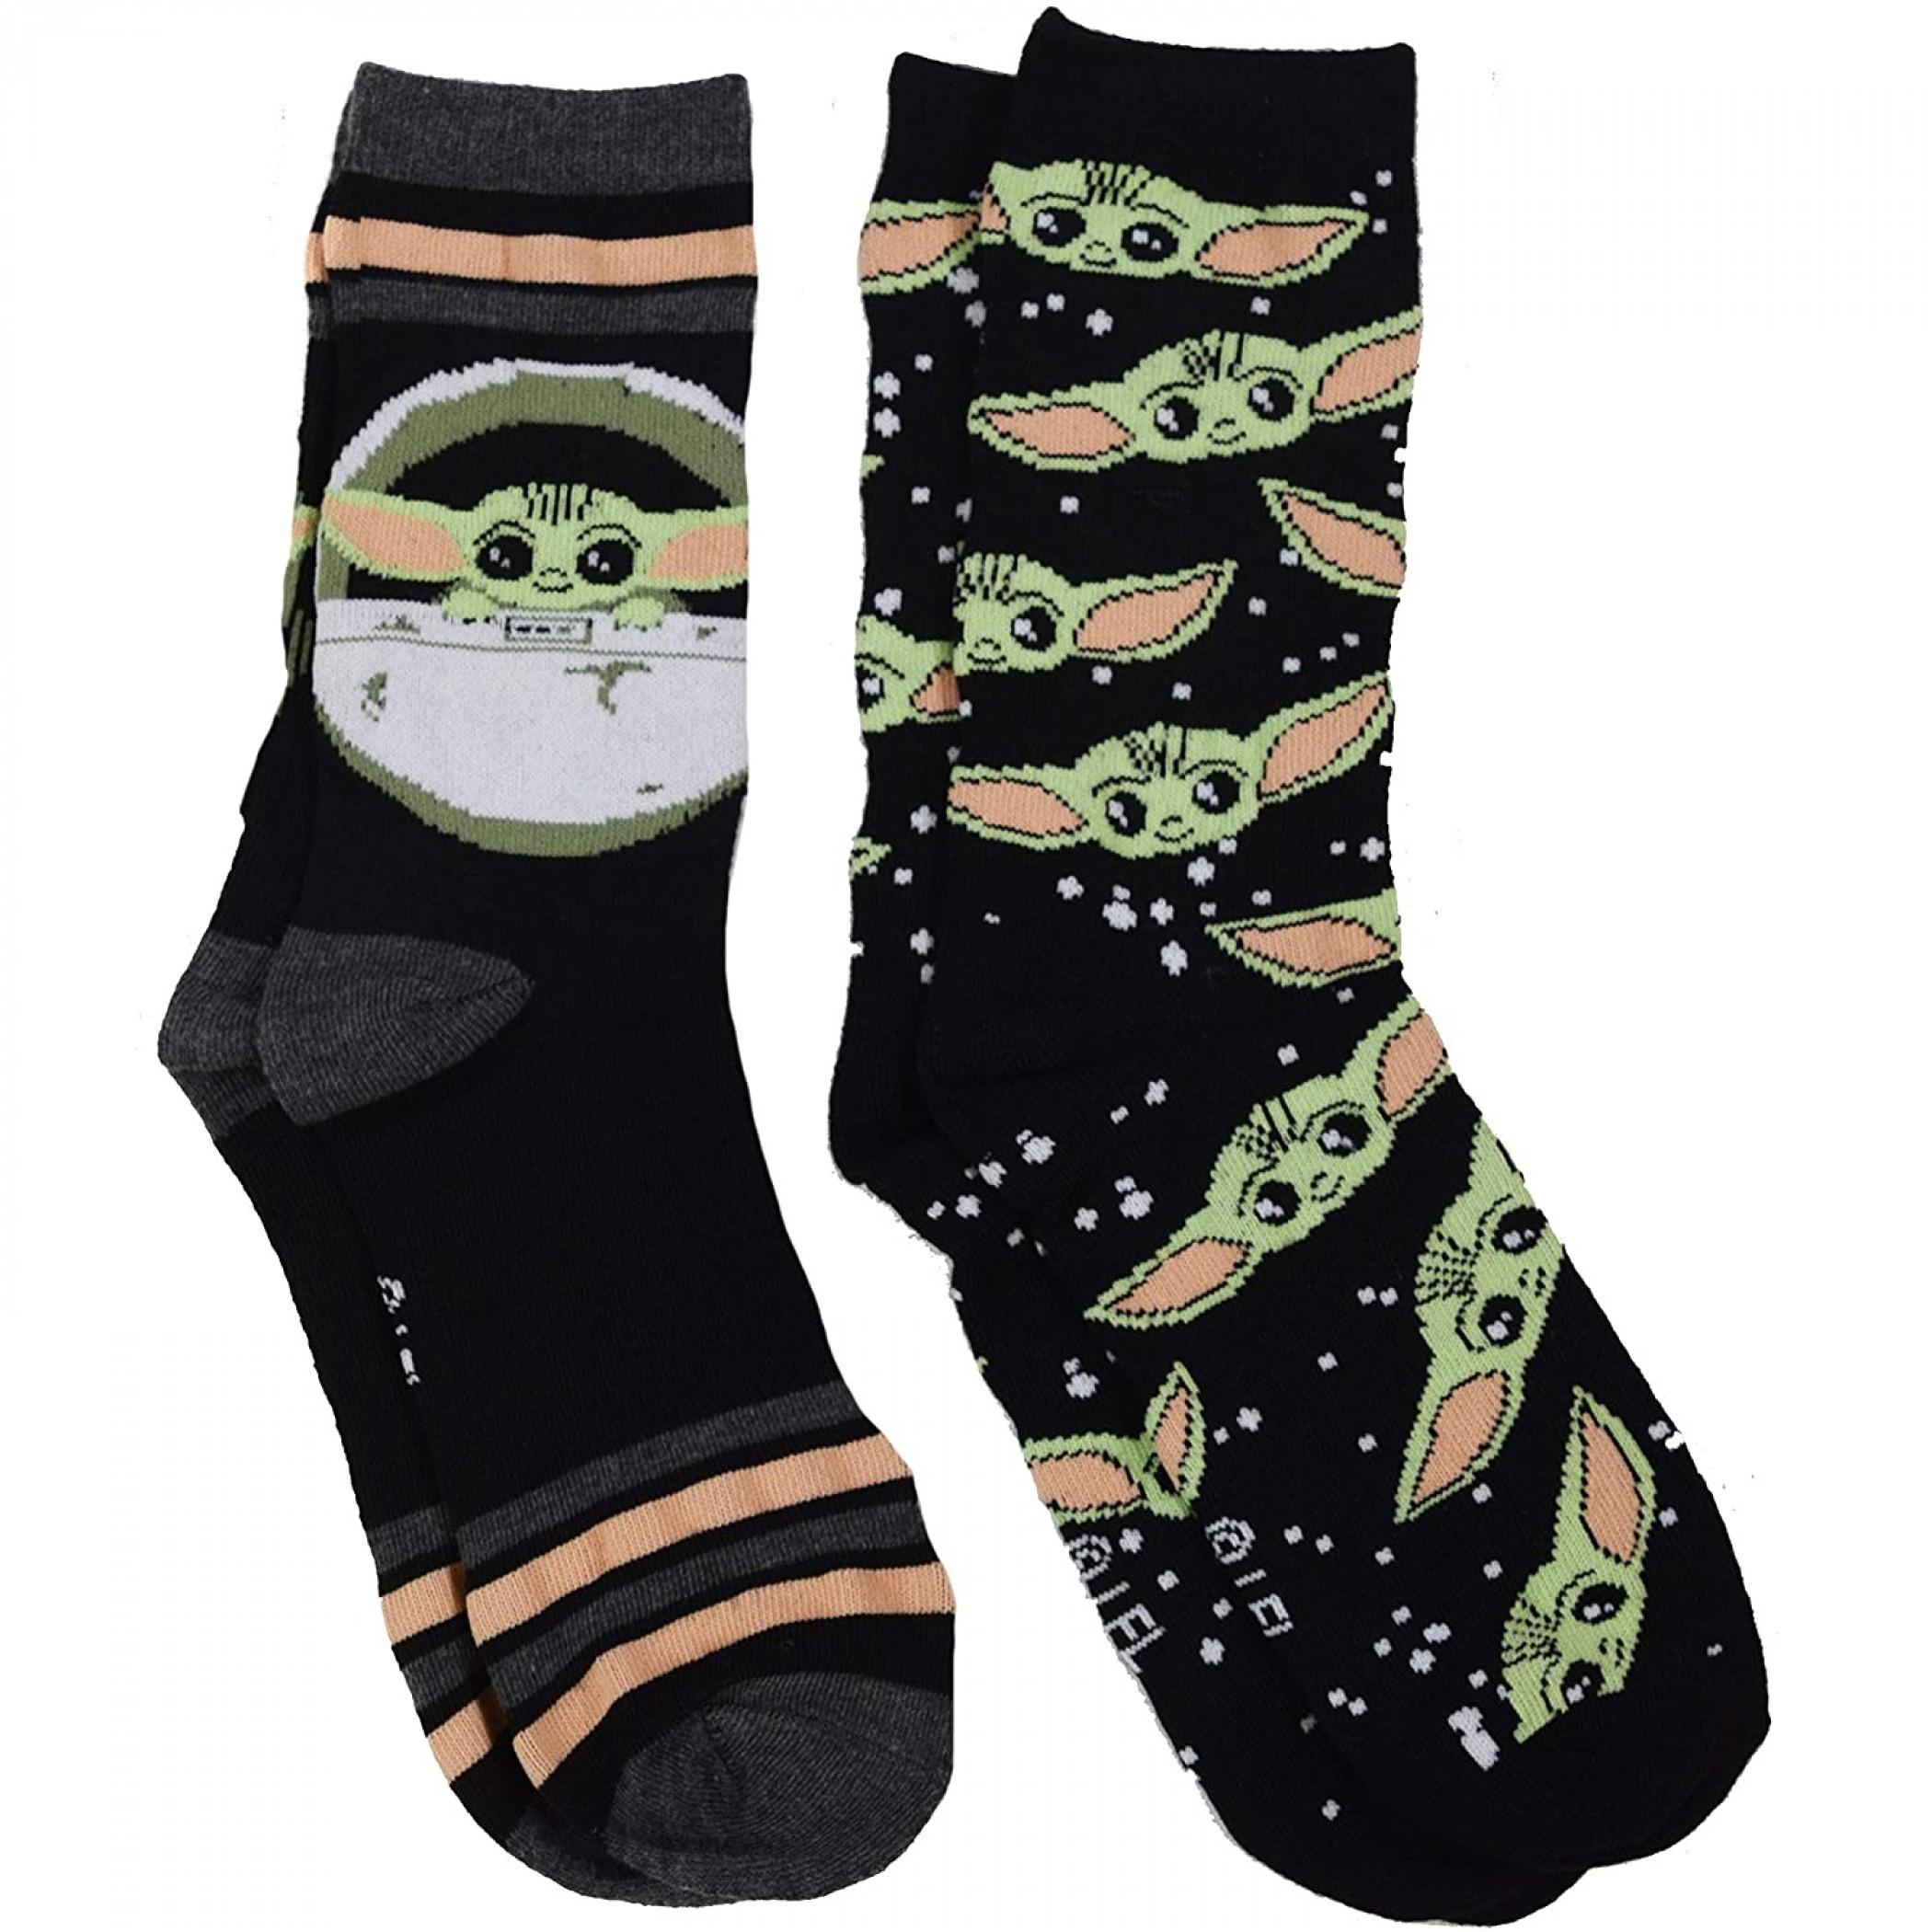 Star Wars The Mandalorian 2-Pair Pack of The Child Women's Crew Socks